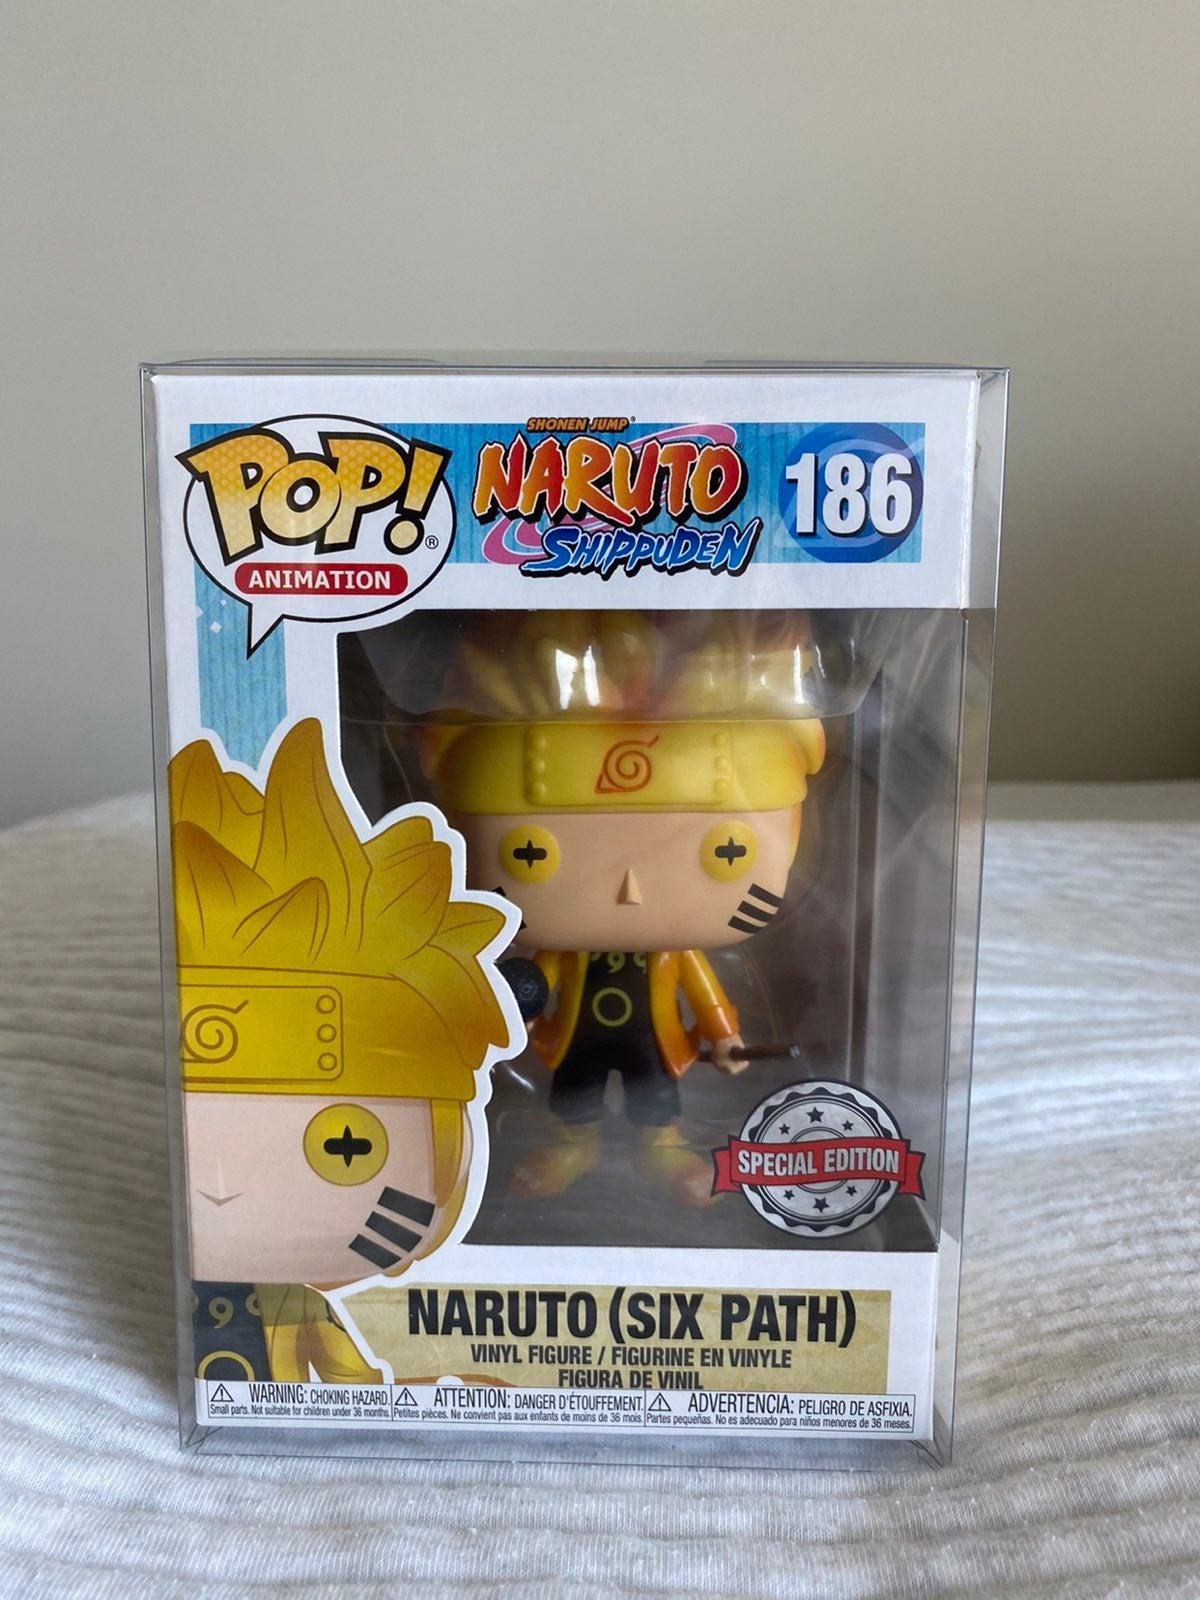 Naruto (Six Path) Funko Pop Hot Topic